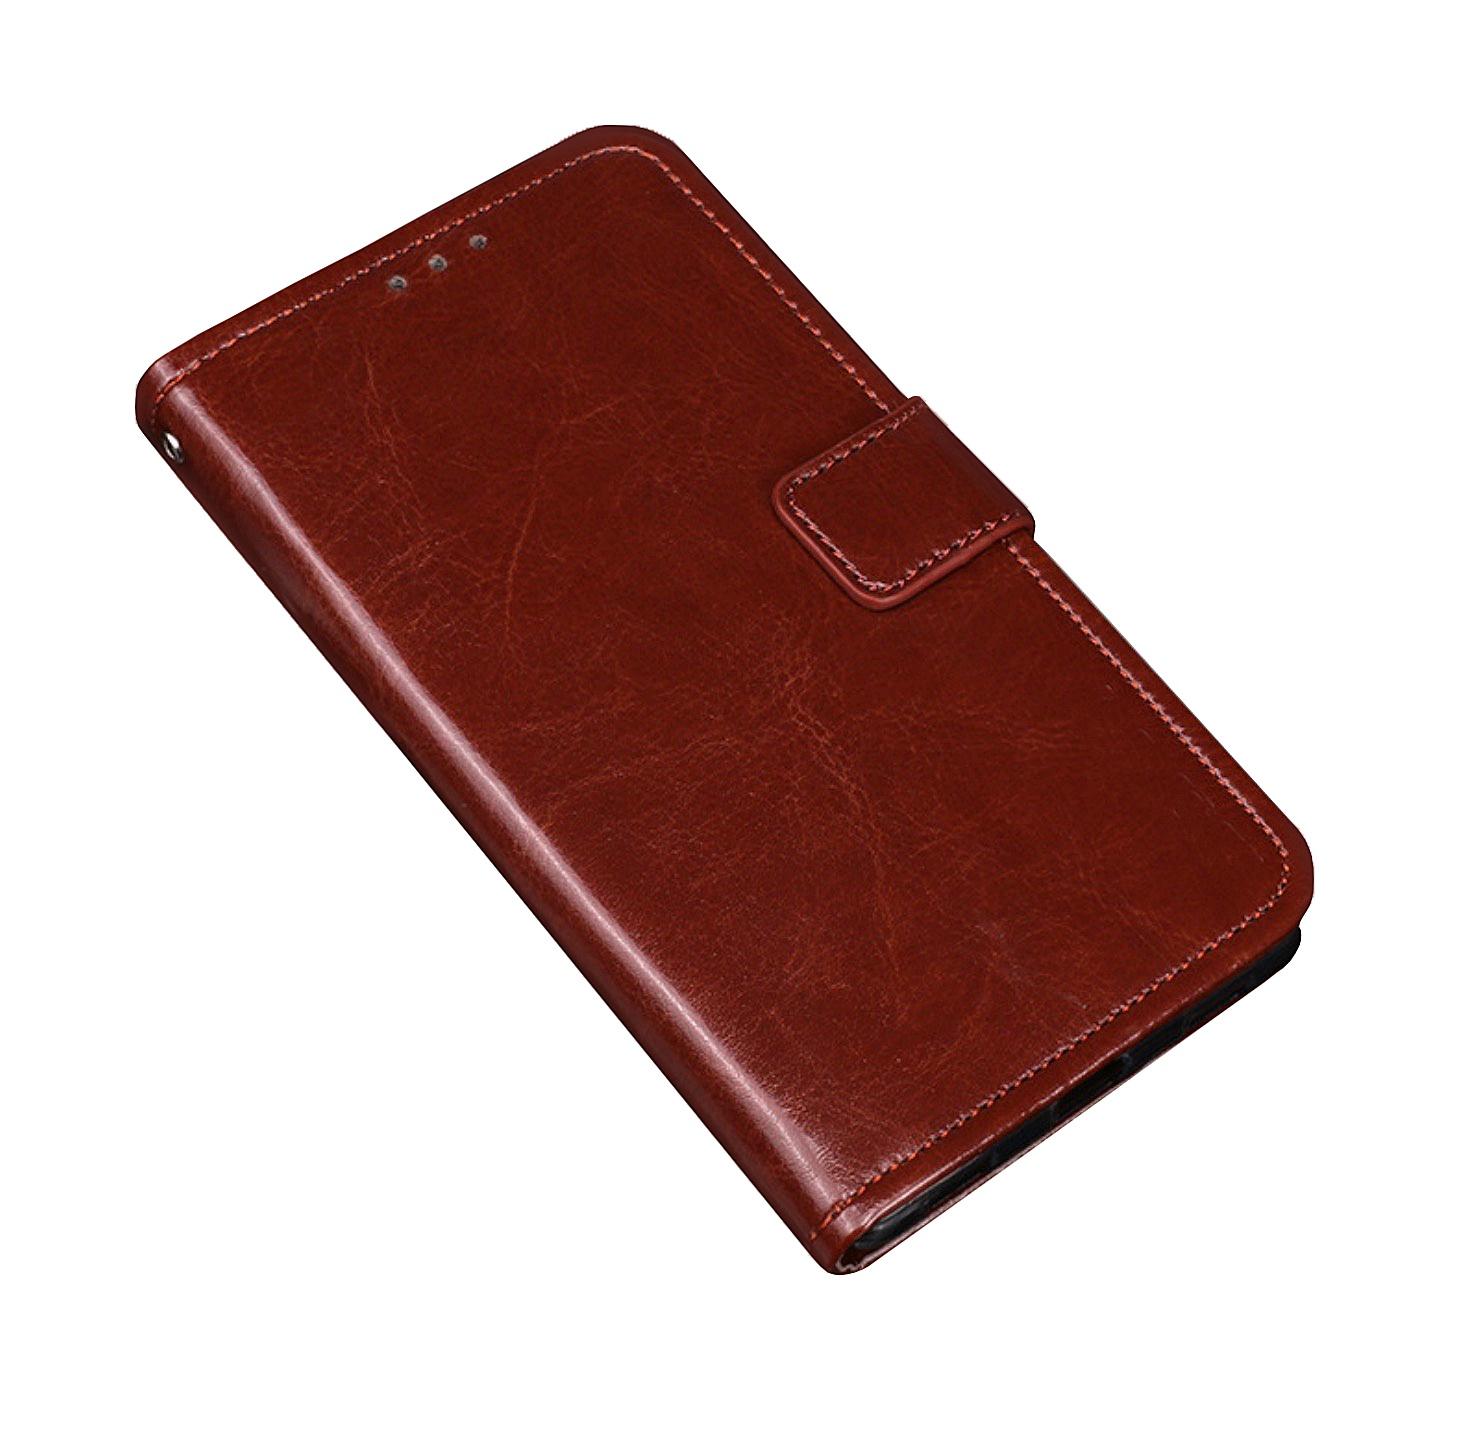 Чехол MyPads для Samsung Galaxy S4 Mini с мульти-подставкой застёжкой и визитницей коричневый